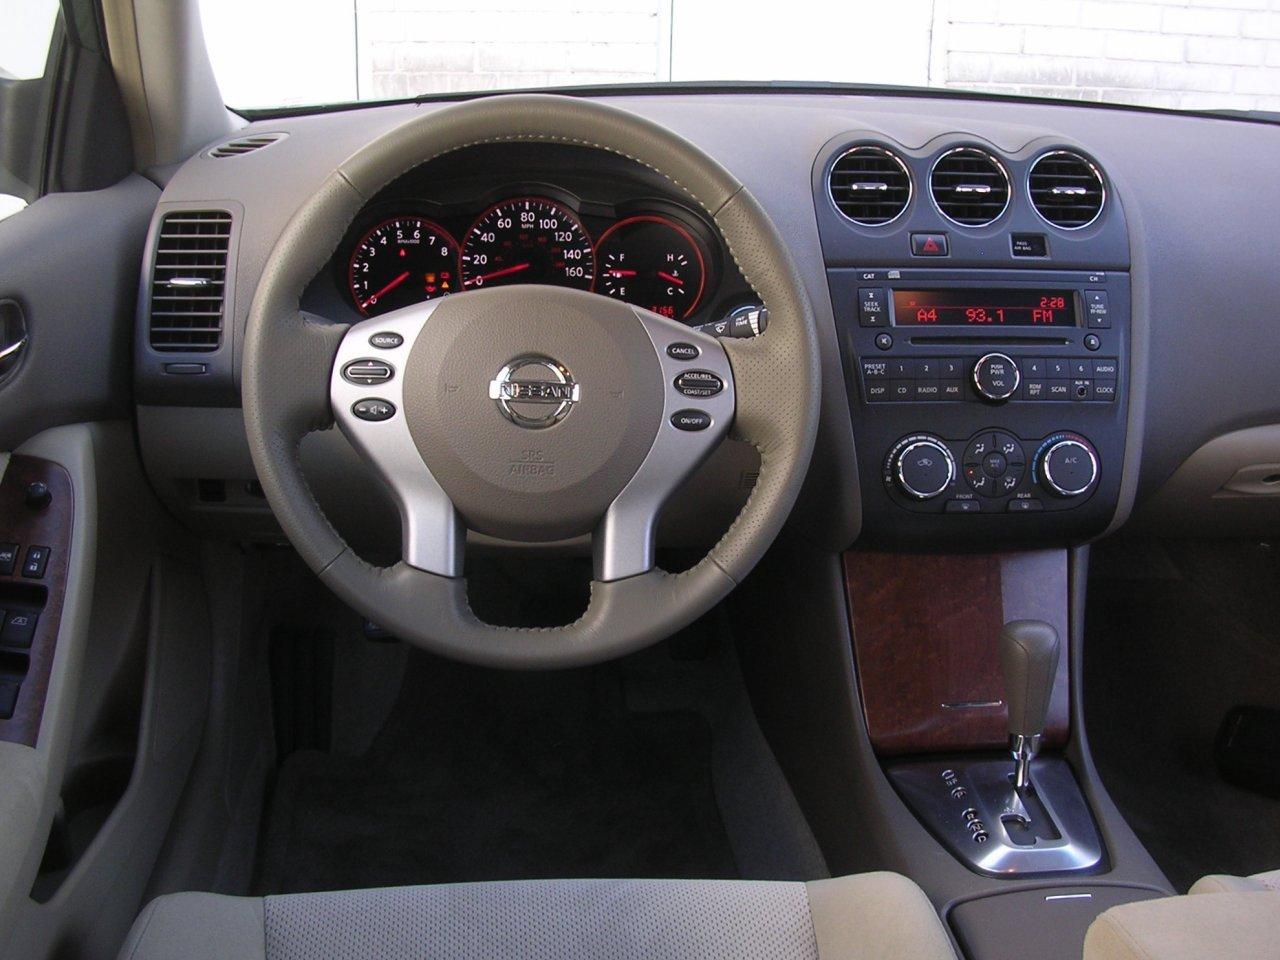 2009 Nissan Altima Interior The Image Kid Has It